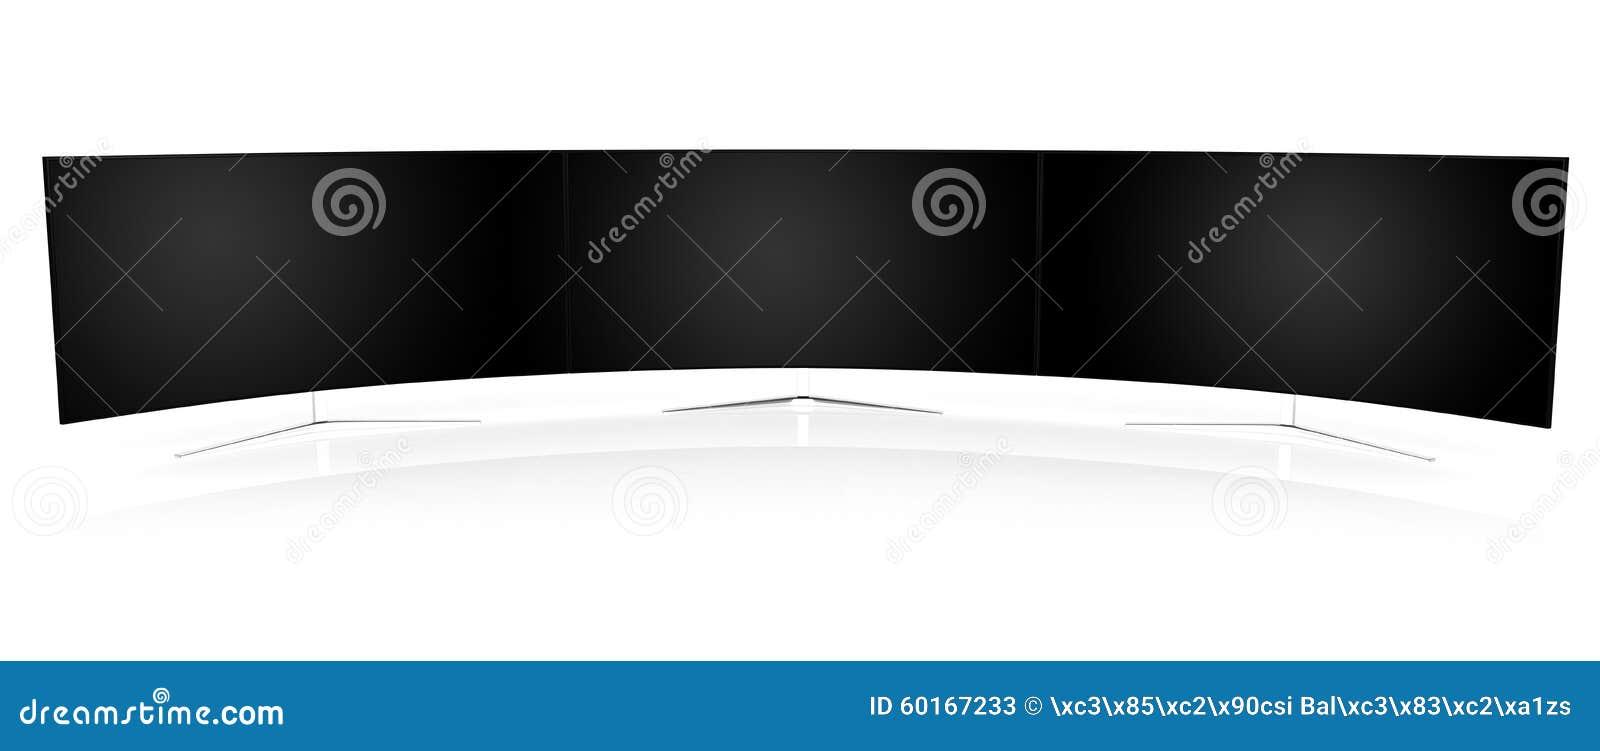 multiple curved monitors stock illustration illustration of display